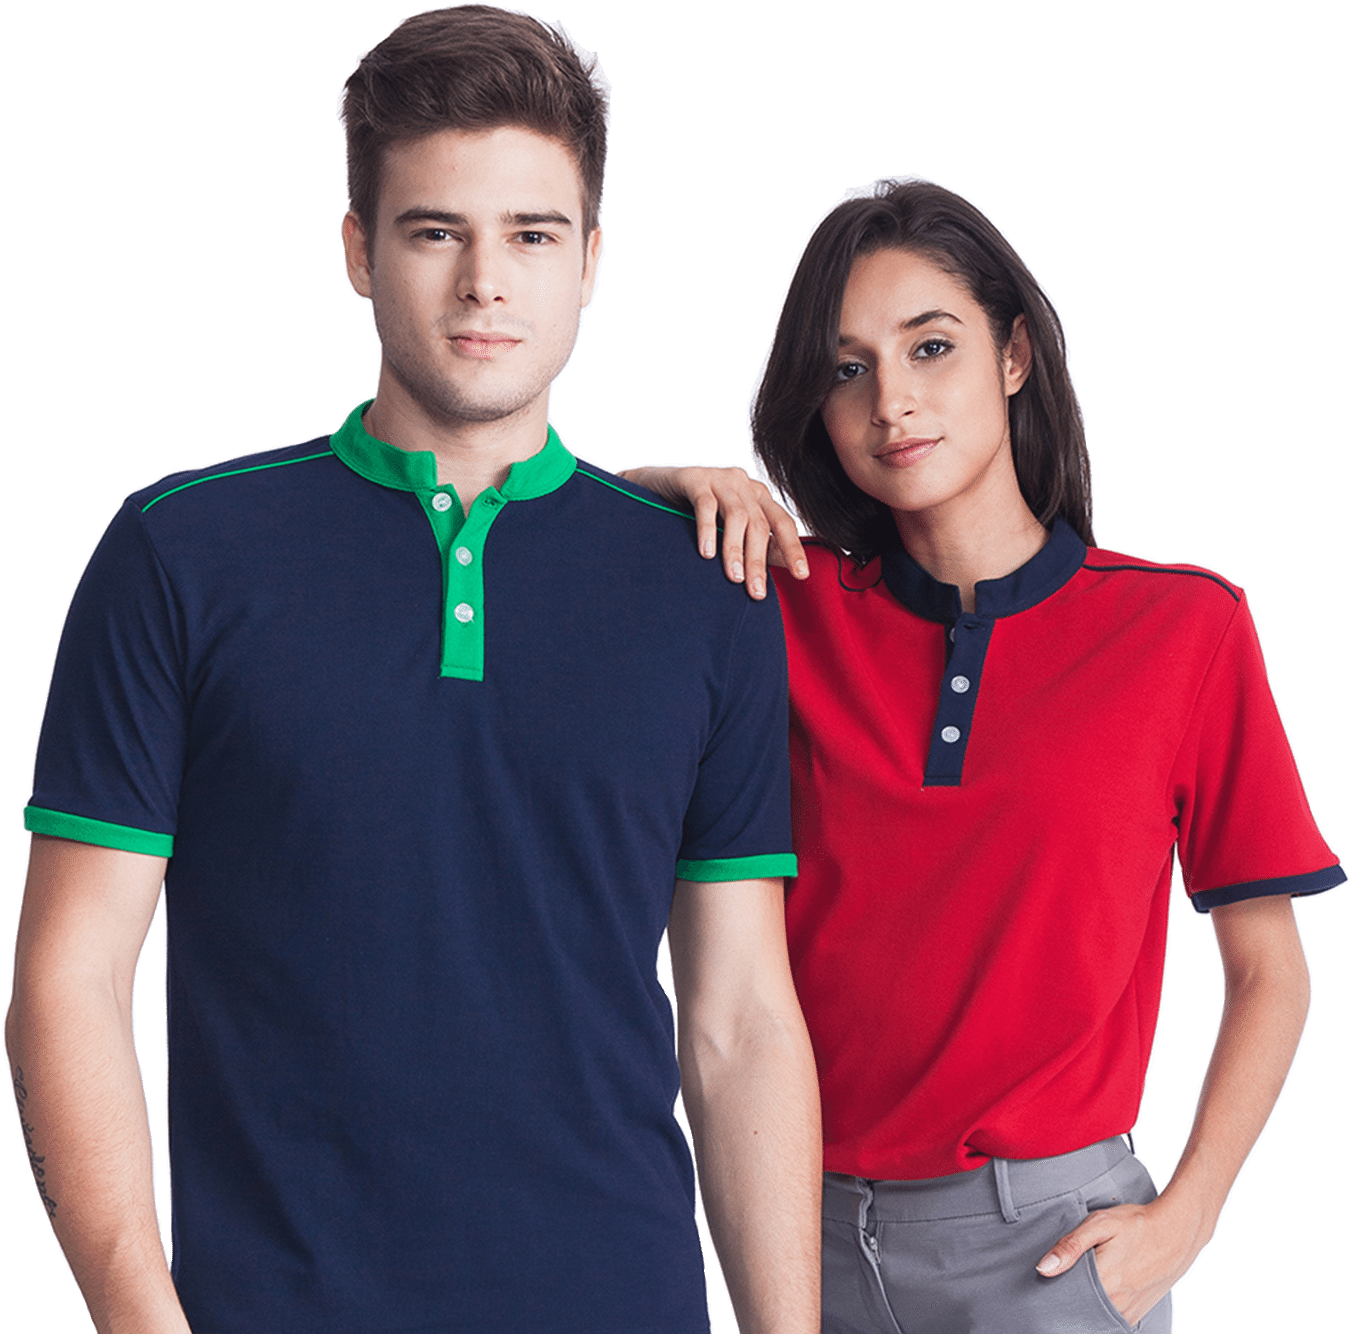 Shirt design online malaysia - Customization Services